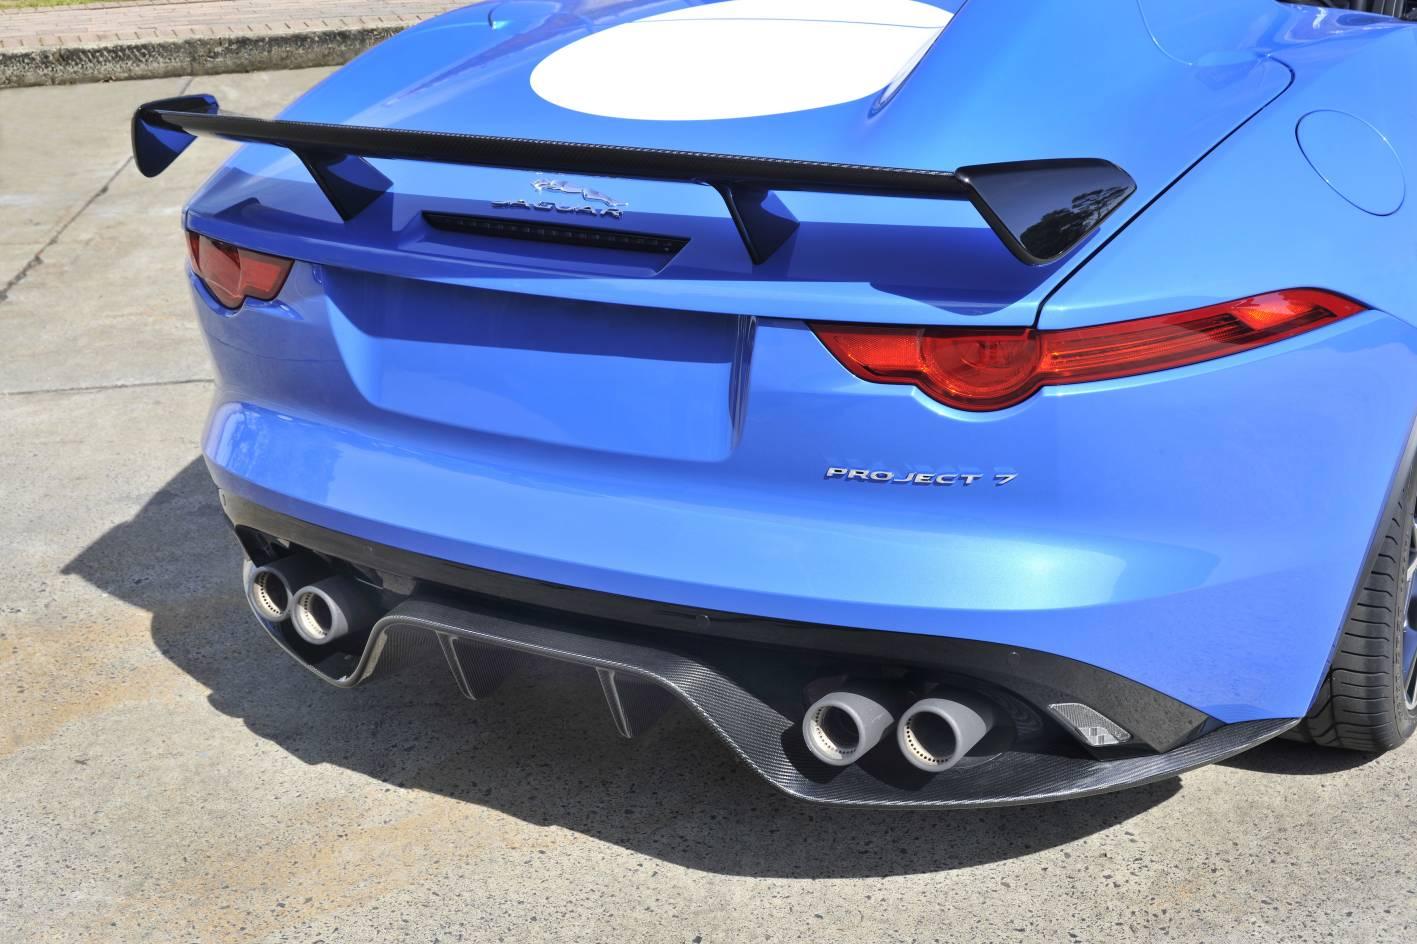 2018 Jaguar Xe Svr >> Limited Edition Jaguar F-Type Project 7 destined for Australia